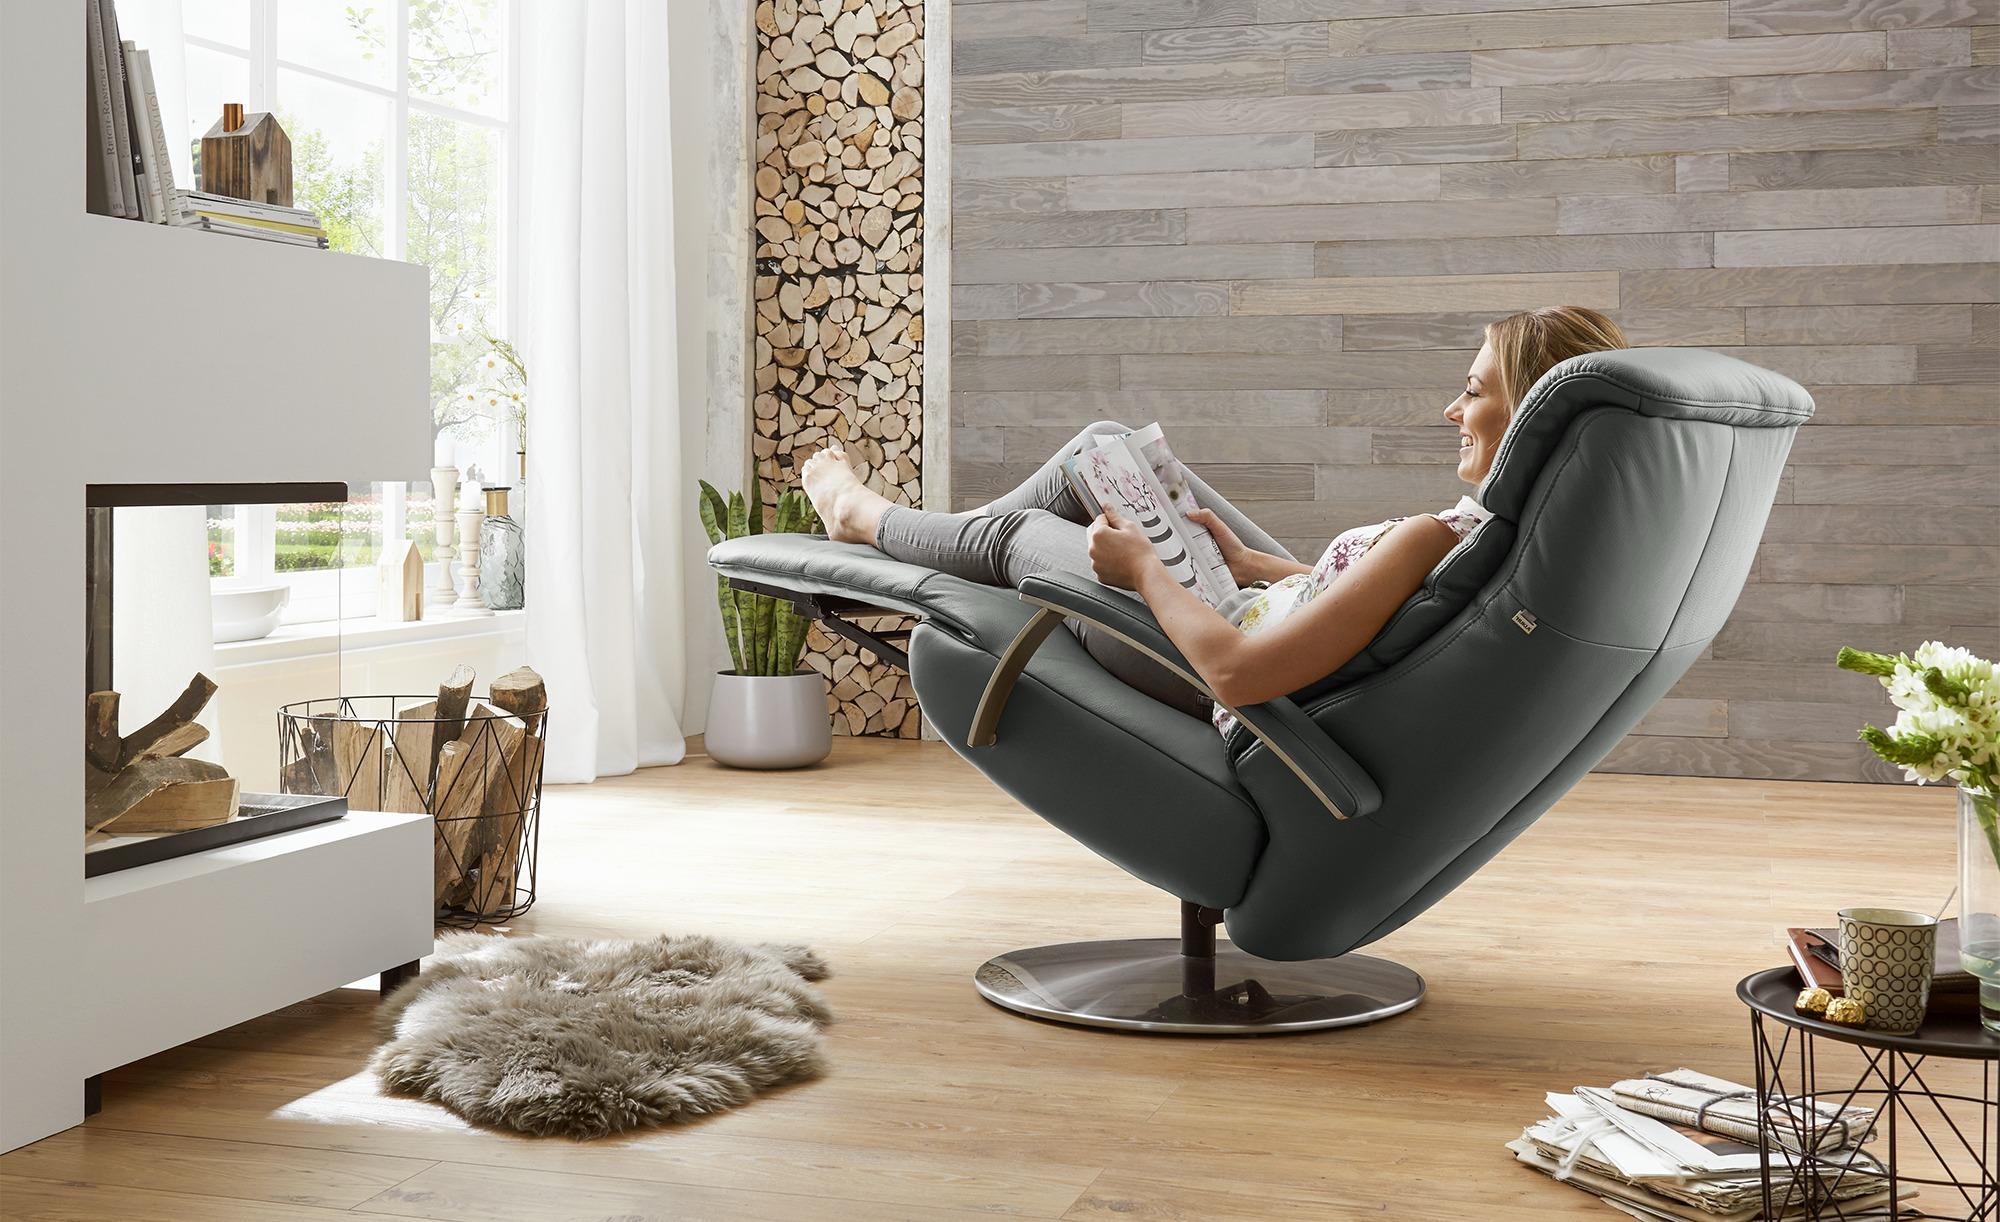 Hukla Leder-Relaxsessel grau - Leder Florian ¦ grau ¦ Maße (cm): B: 73 T: 91 Polstermöbel > Sessel > Fernsehsessel - Höffner